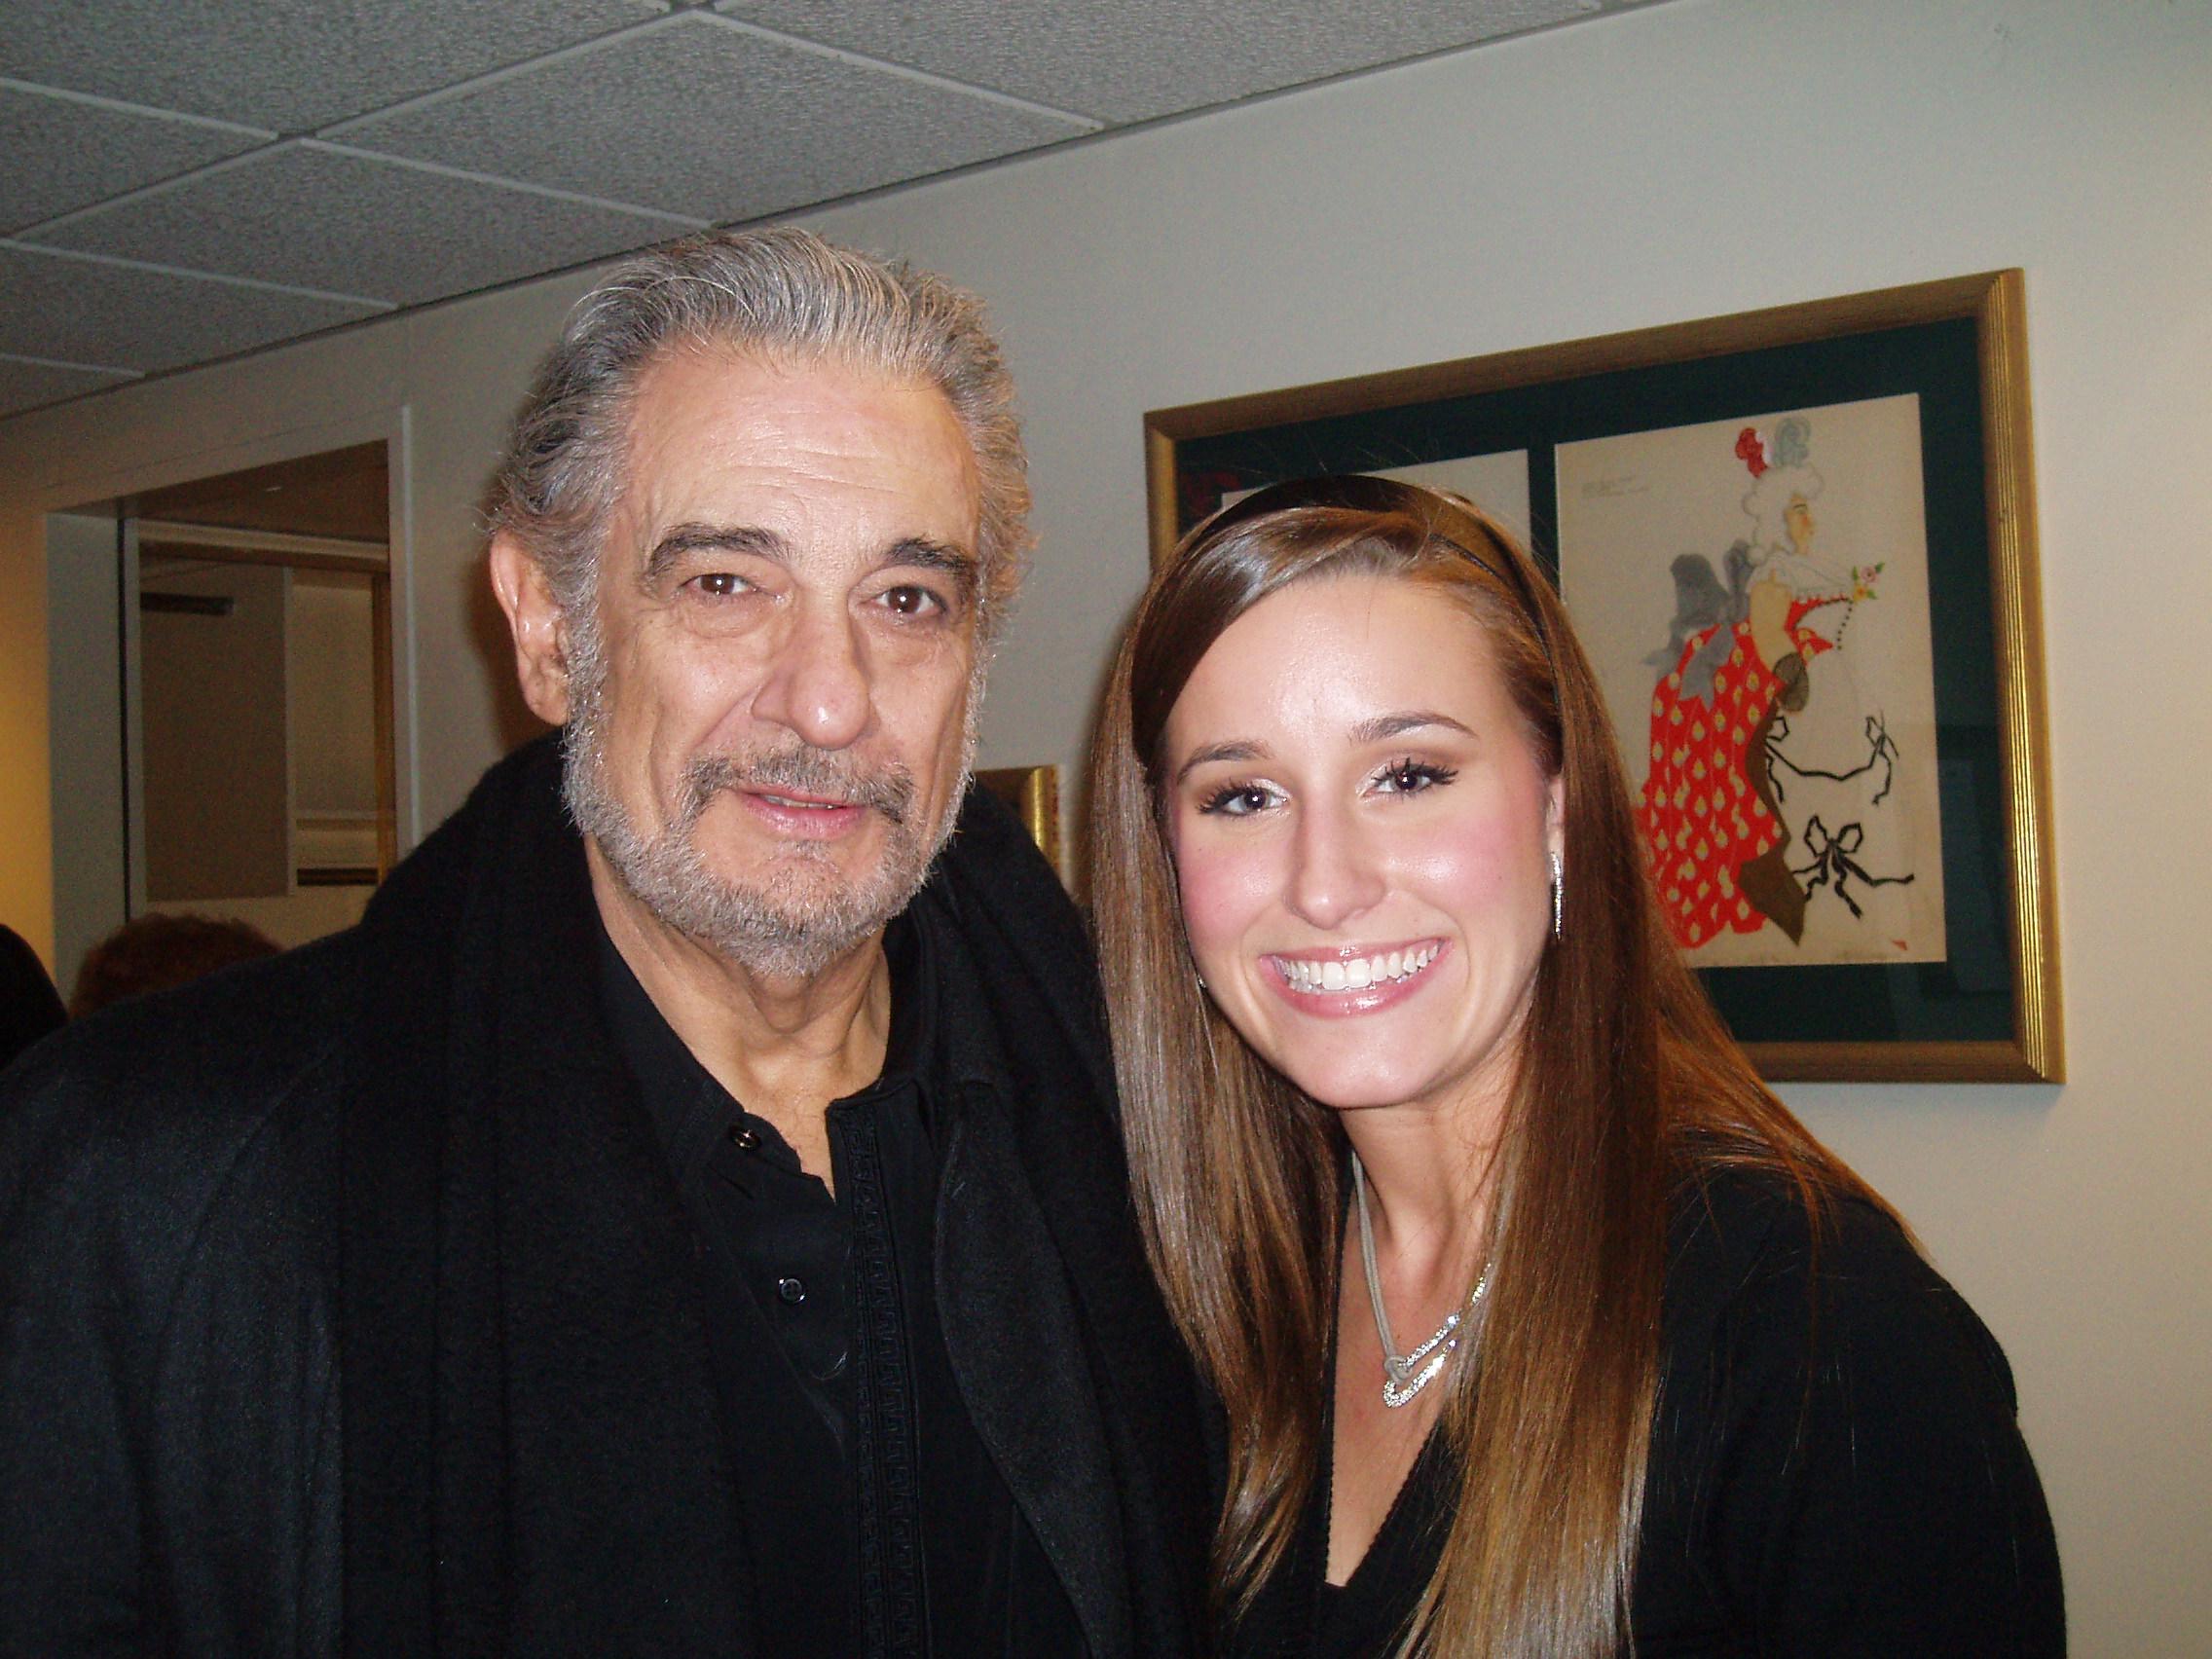 with Placido Domingo